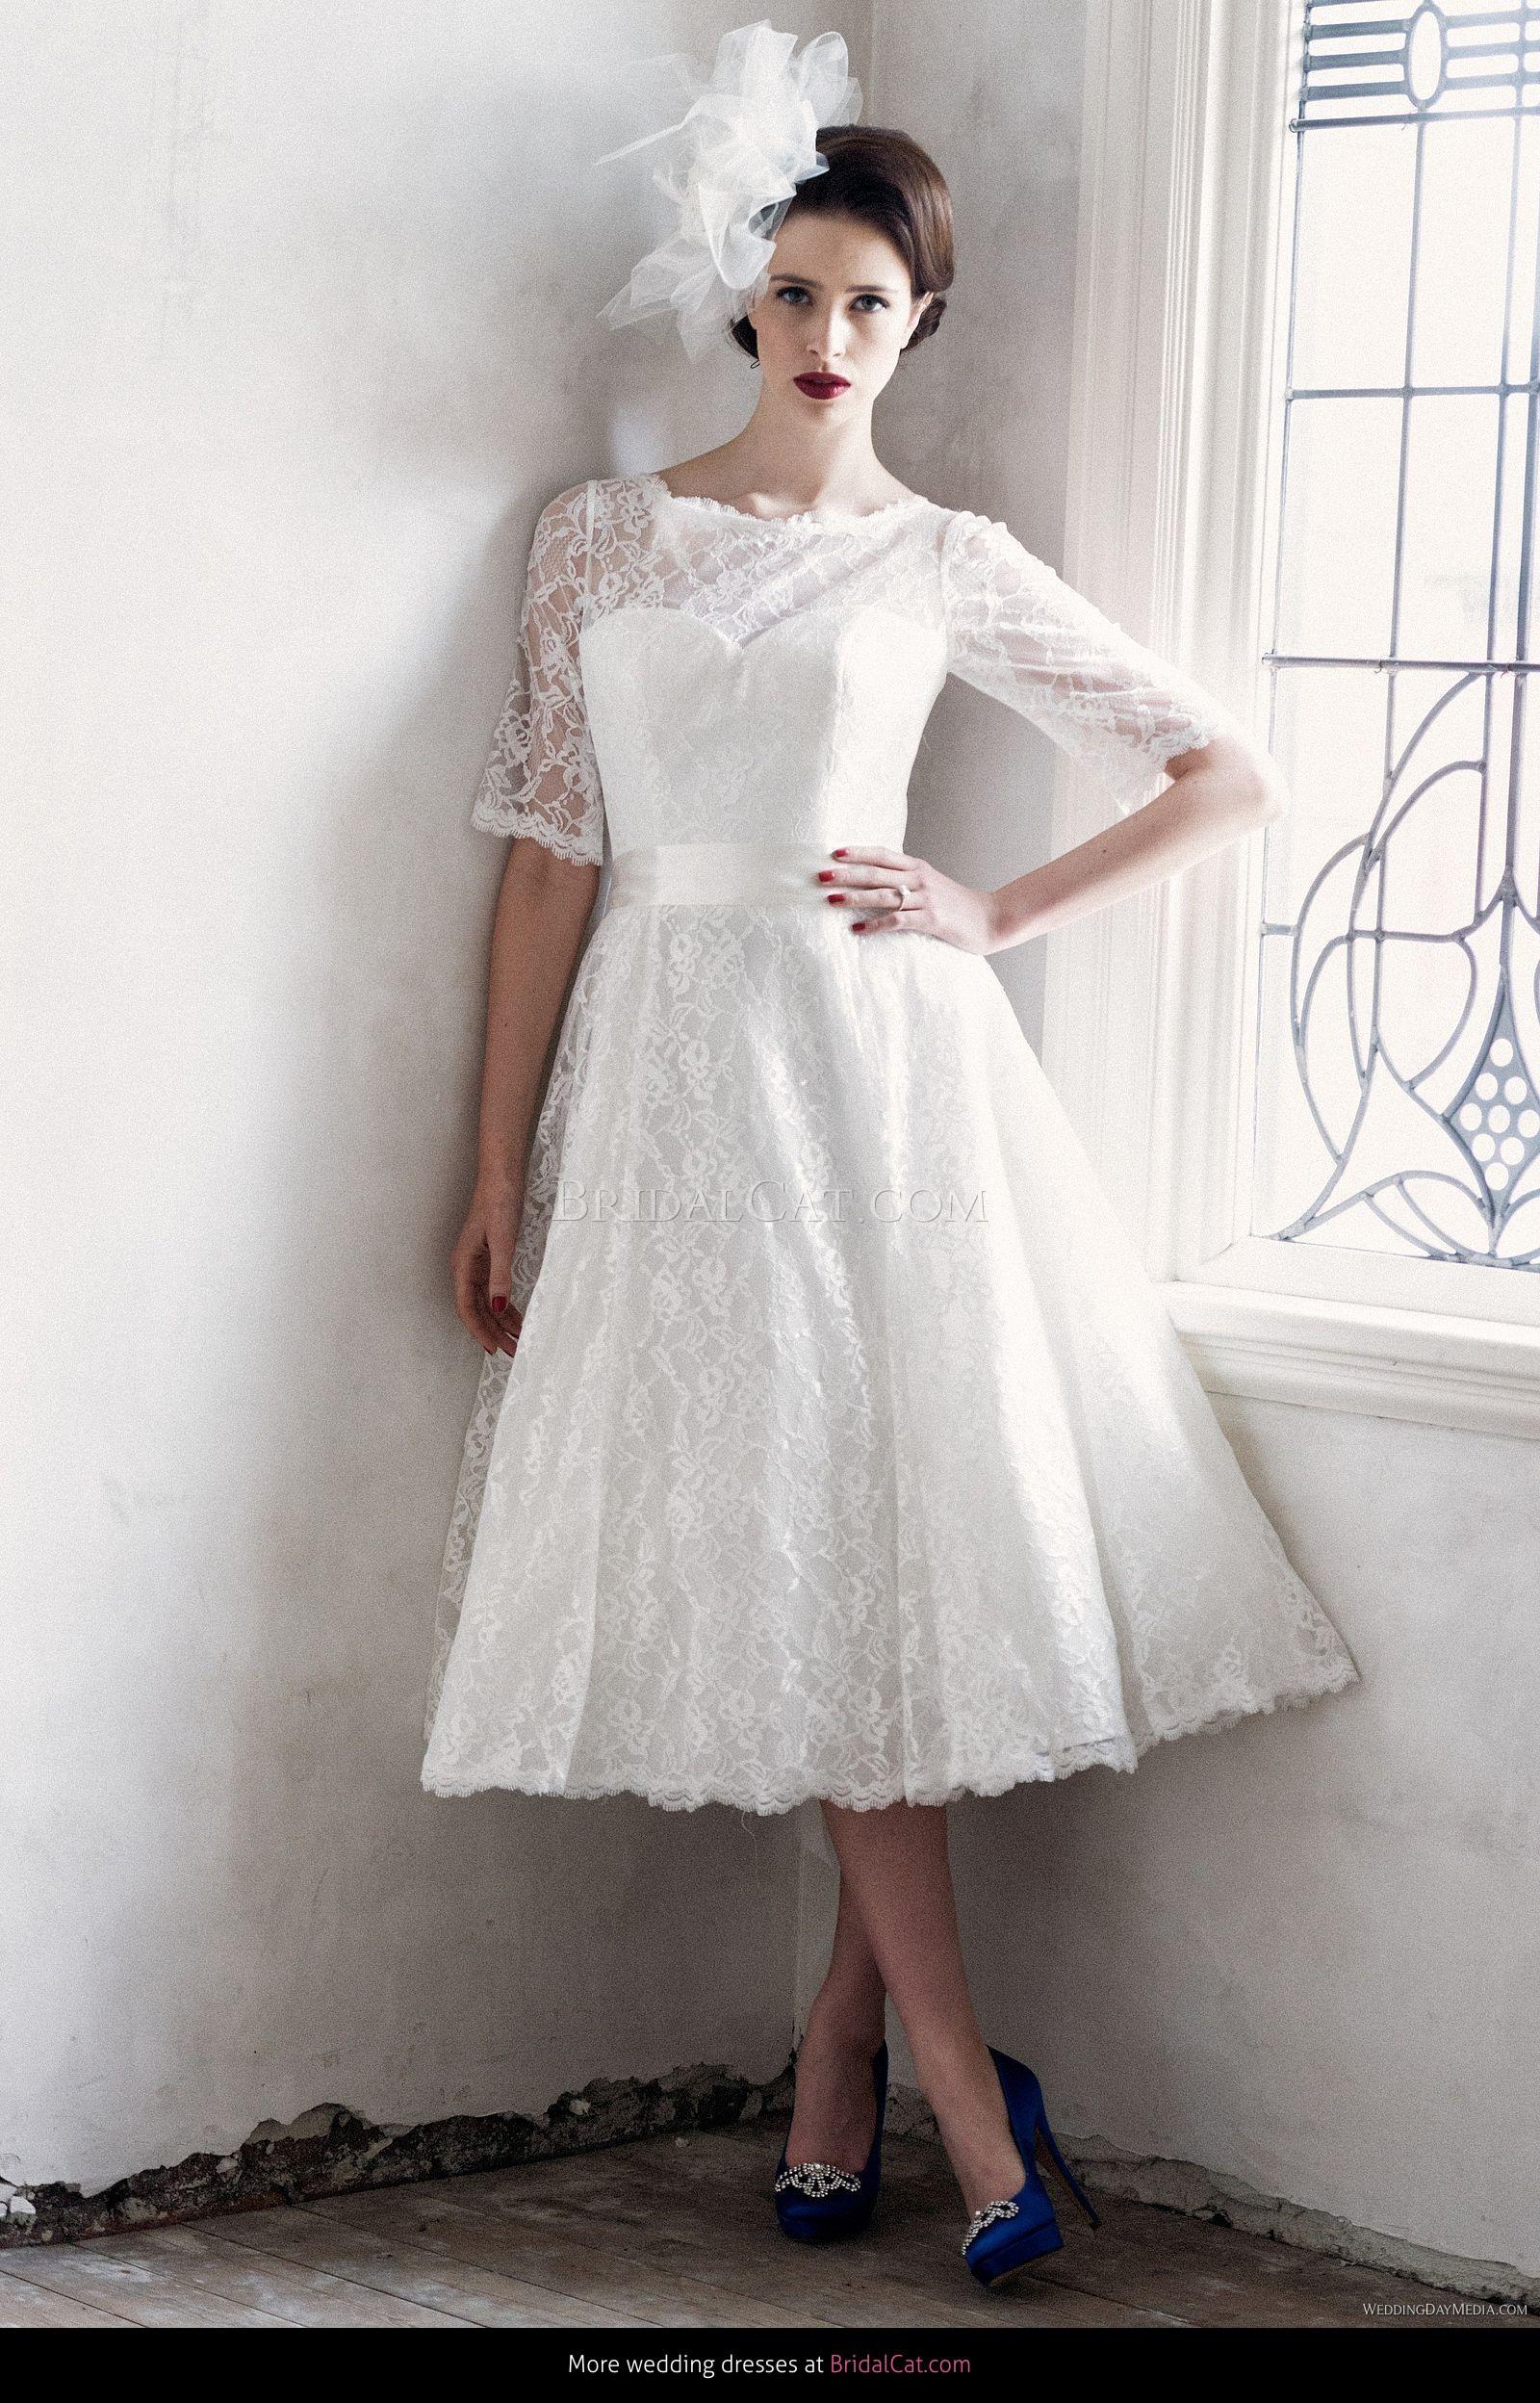 New  Lace Tea Length Wedding Dress White//Ivory Short Bride Dress Size 6-18